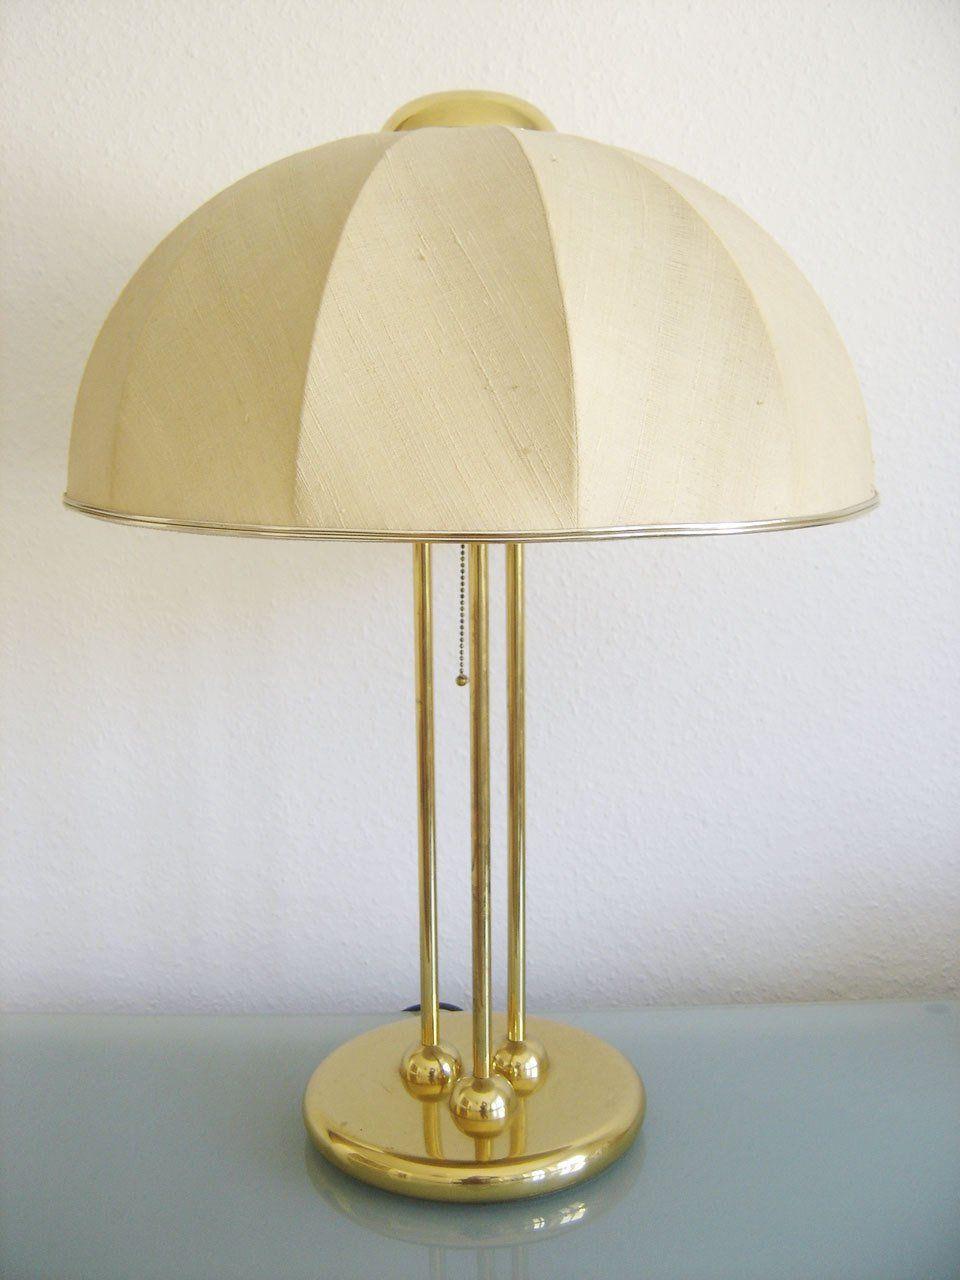 Monumental Mid Century Modern Xxl Table Lamp Bedside Light 1950s